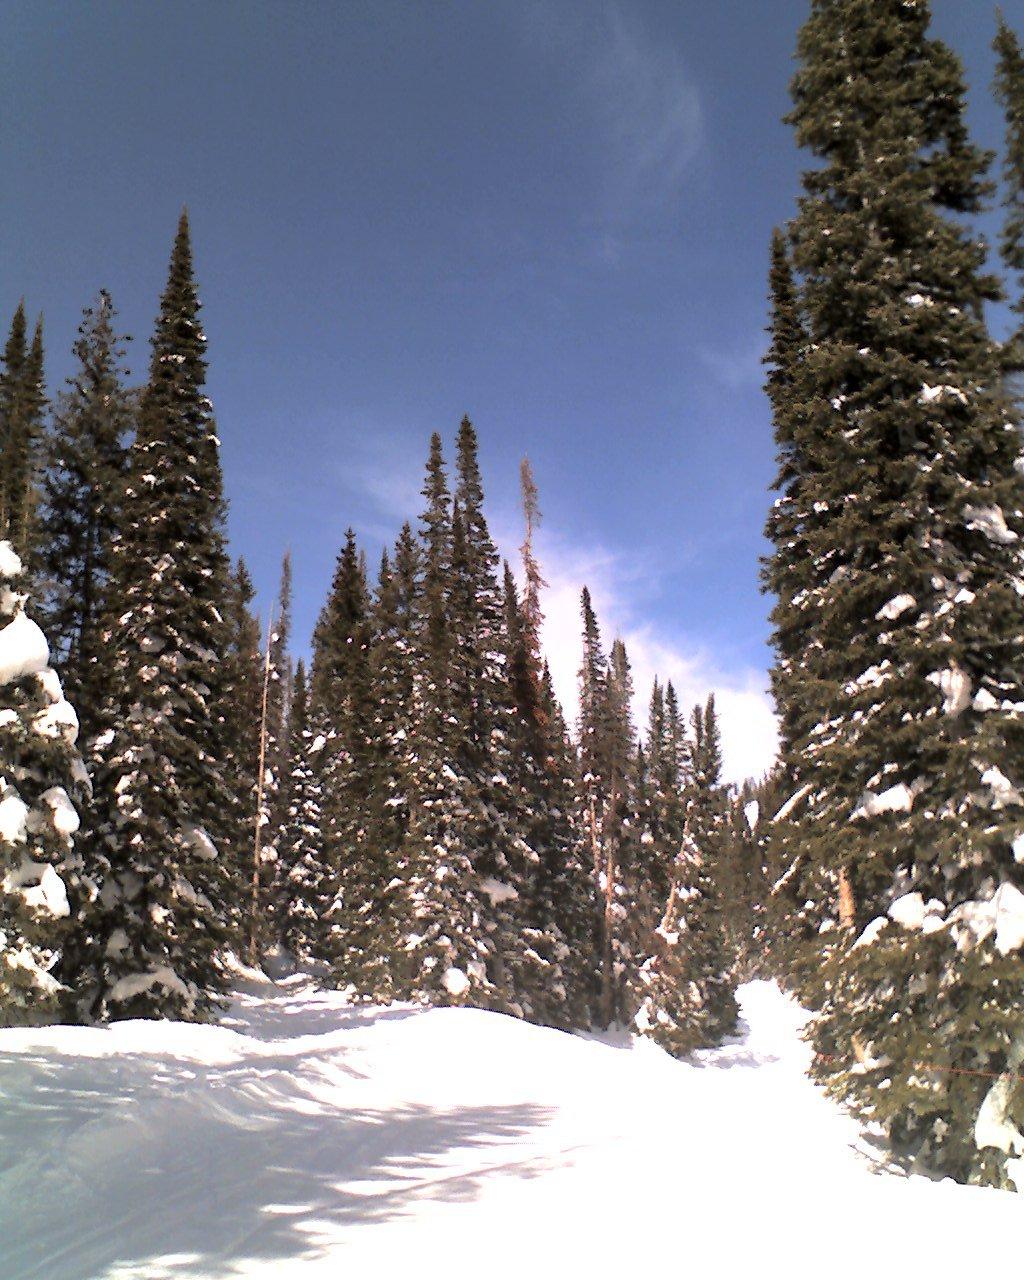 Skiing - 3 of 18